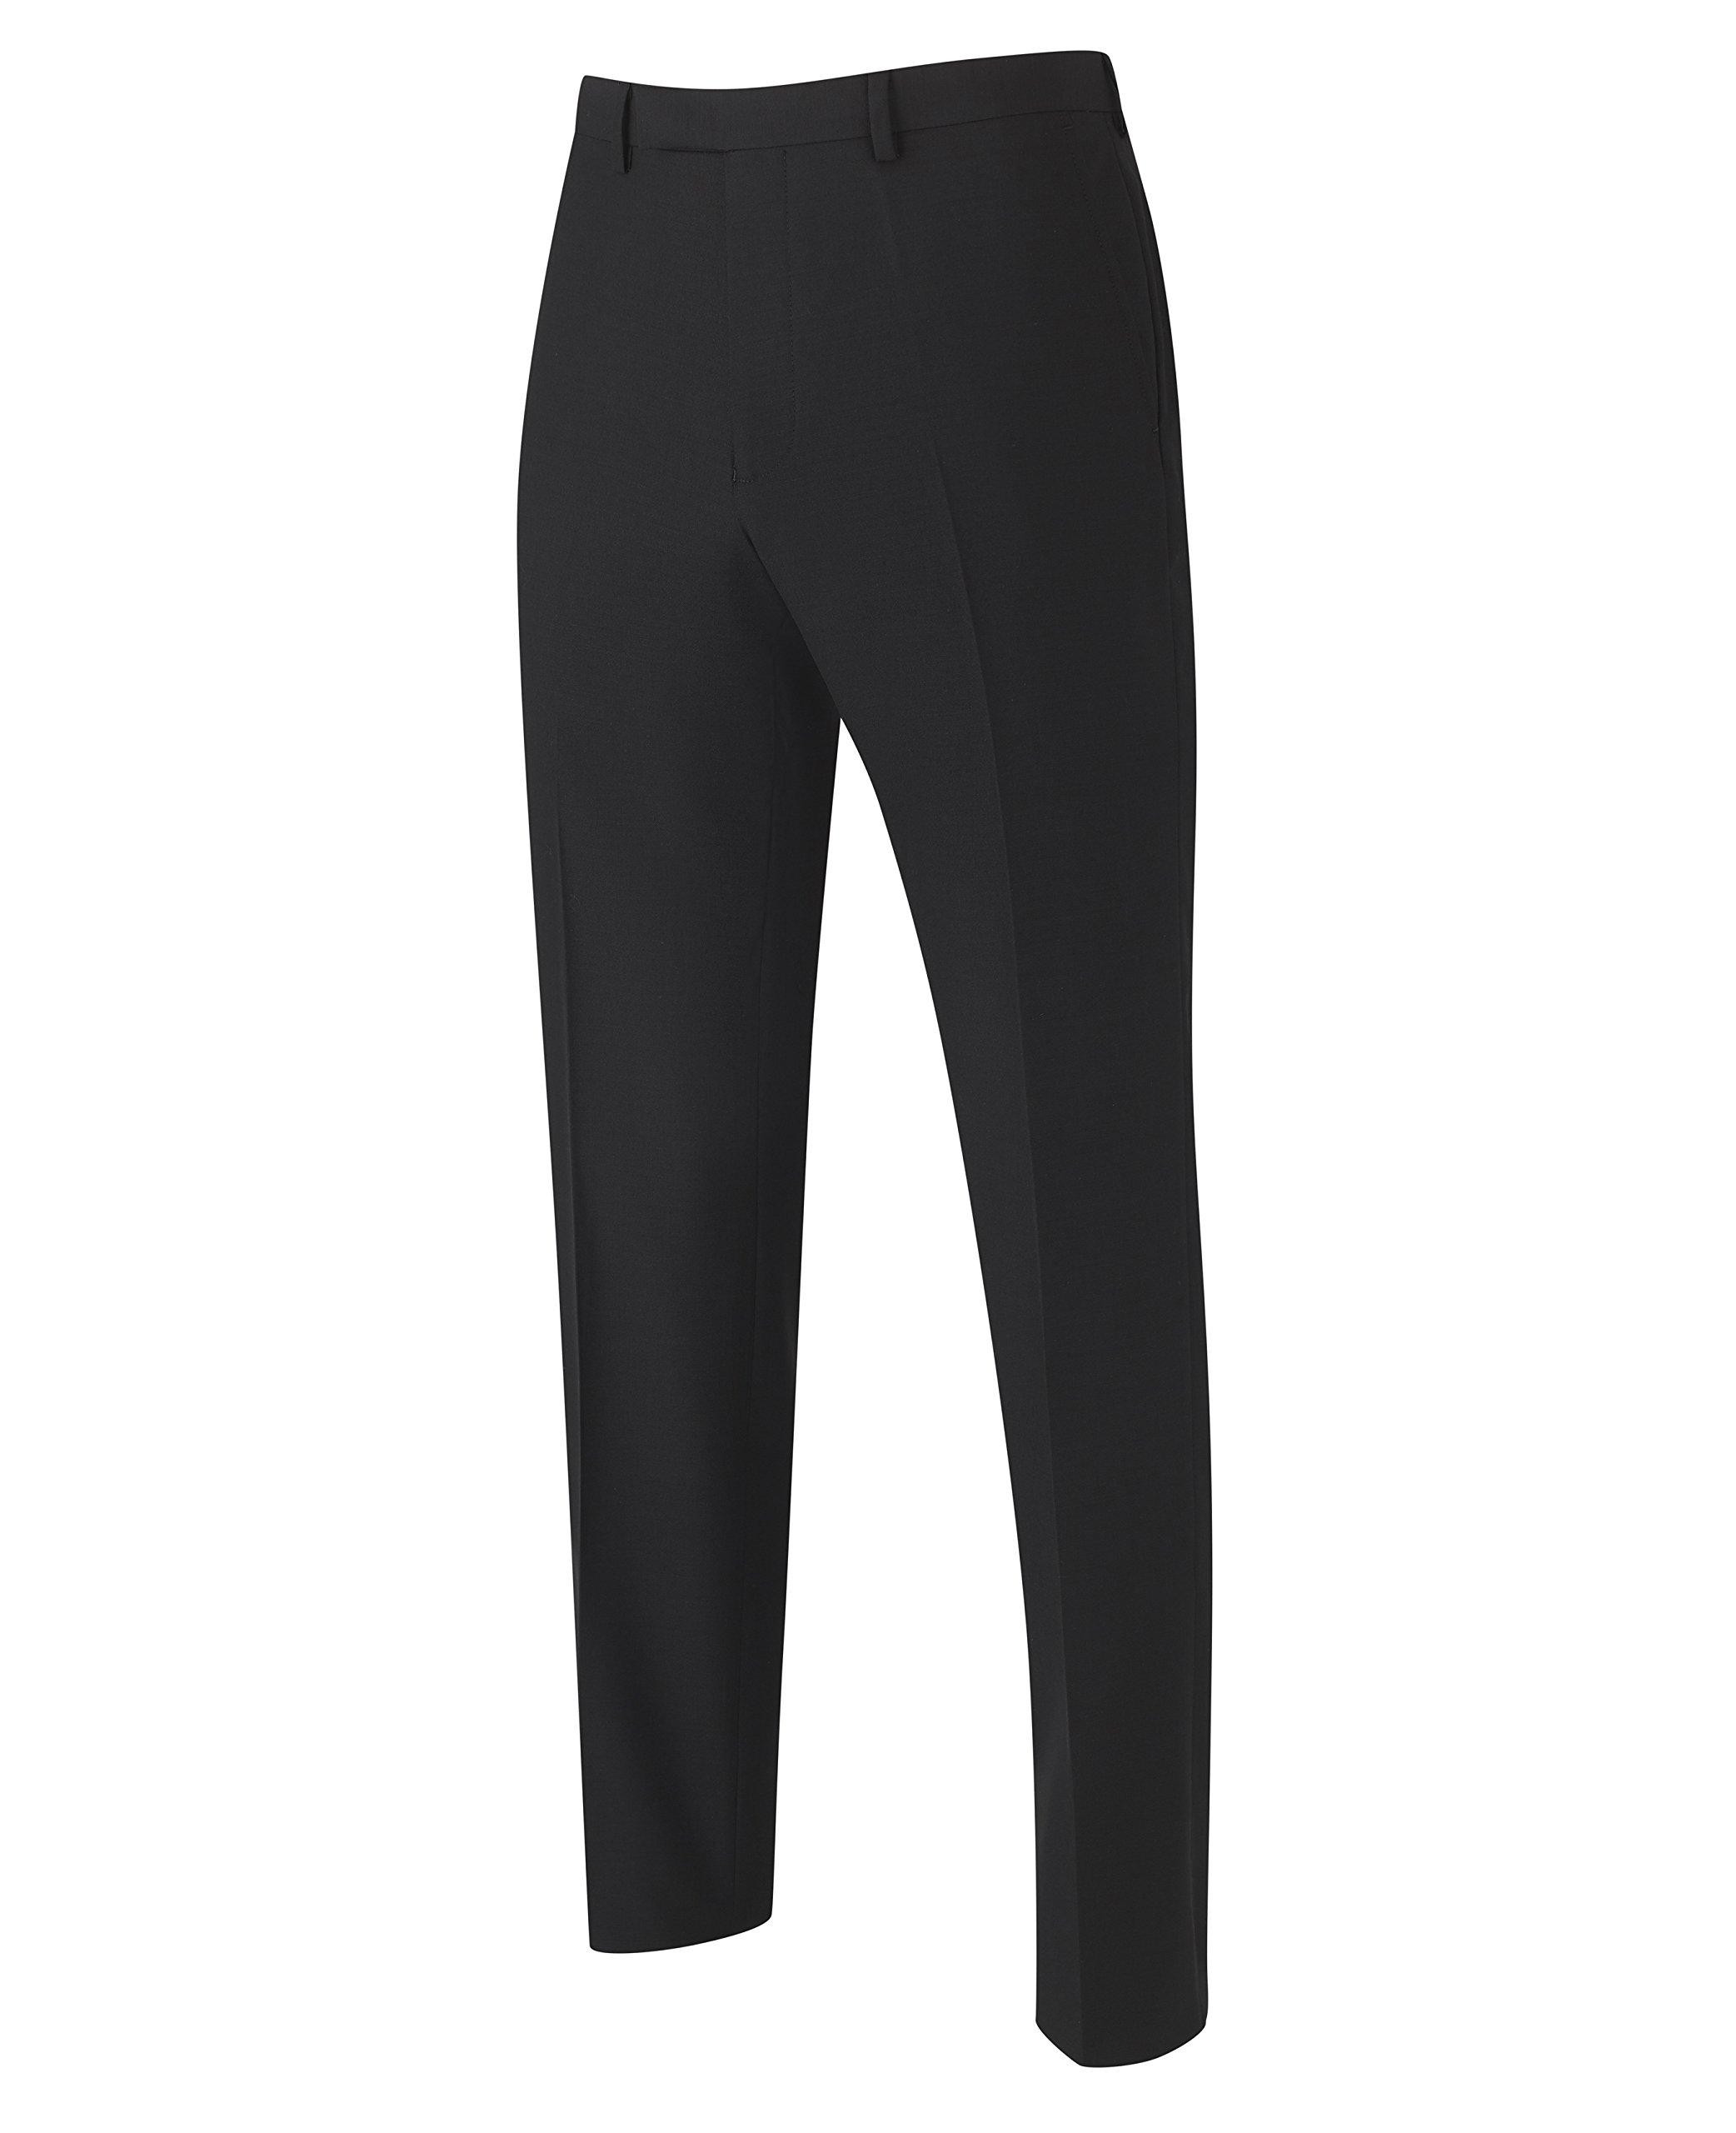 The Savile Row Company Savile Row Men's Black Tailored Business Suit Separate Dress Pant 34'' 32'' by The Savile Row Company